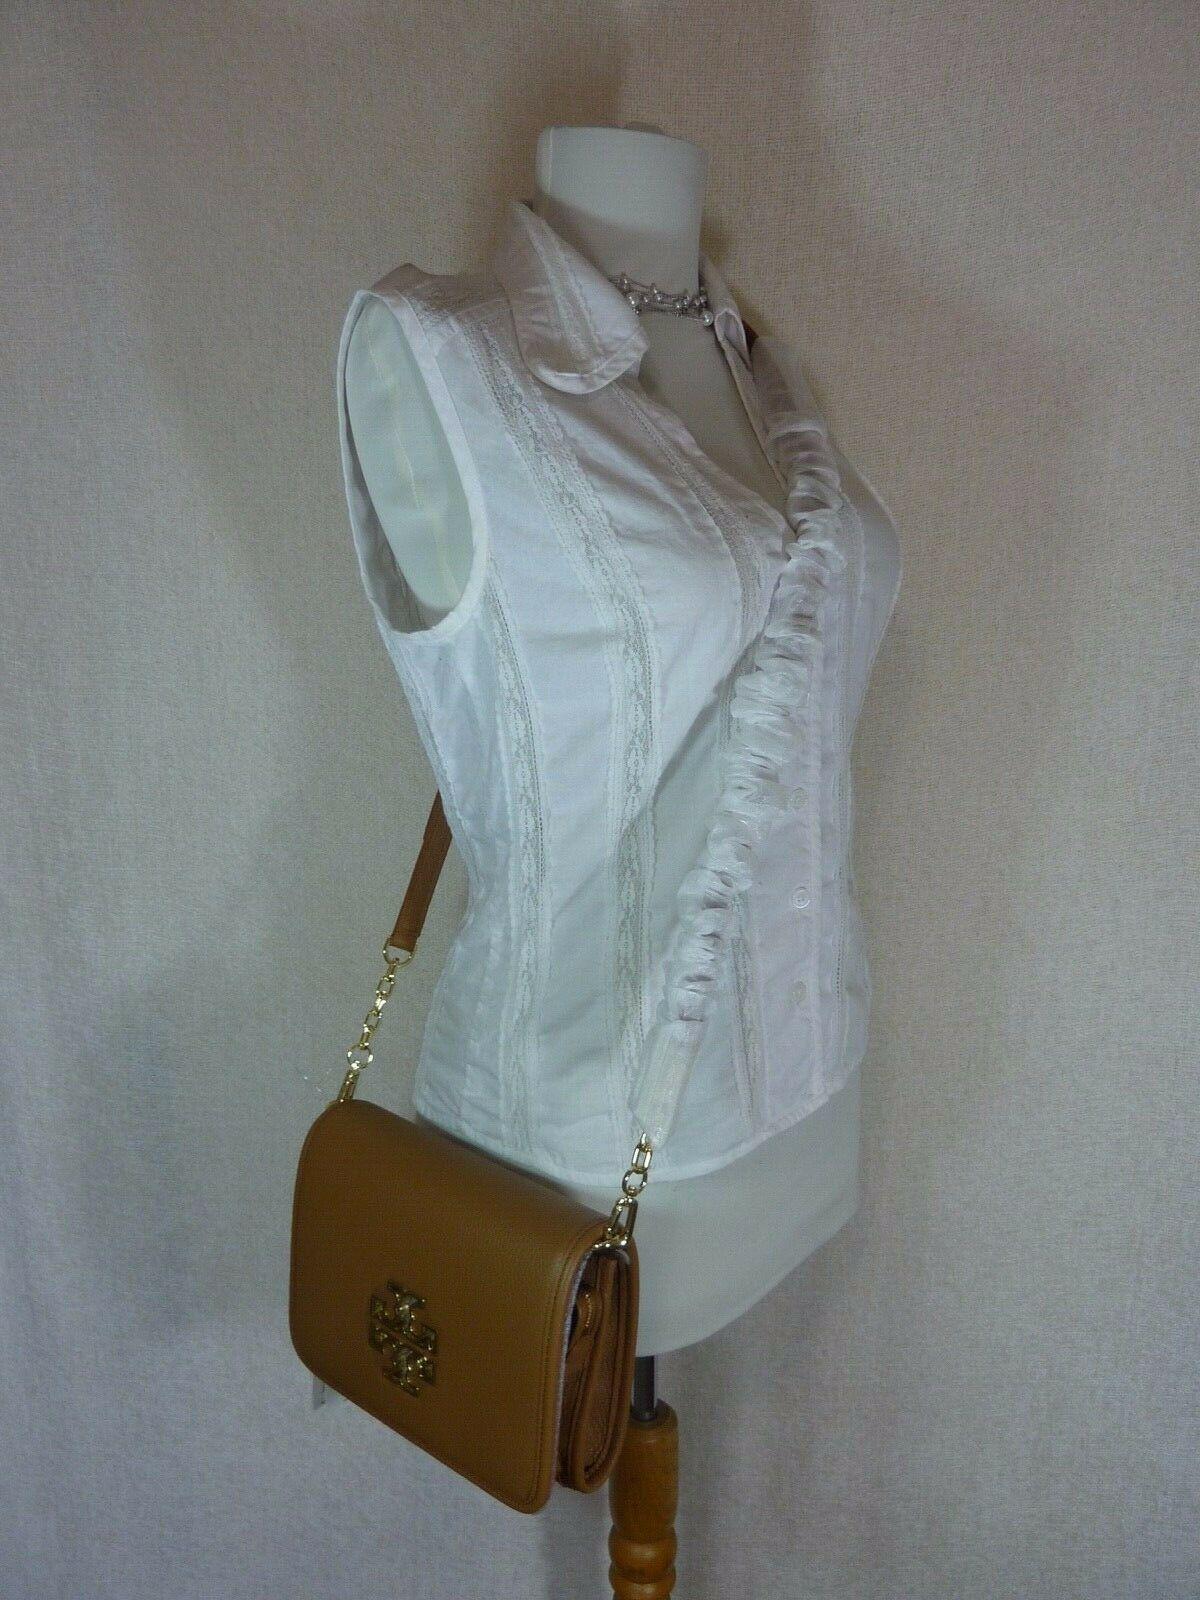 NWT Tory Burch Bark Leather Britten Combo Cross Body bag/Clutch  - $425 image 10